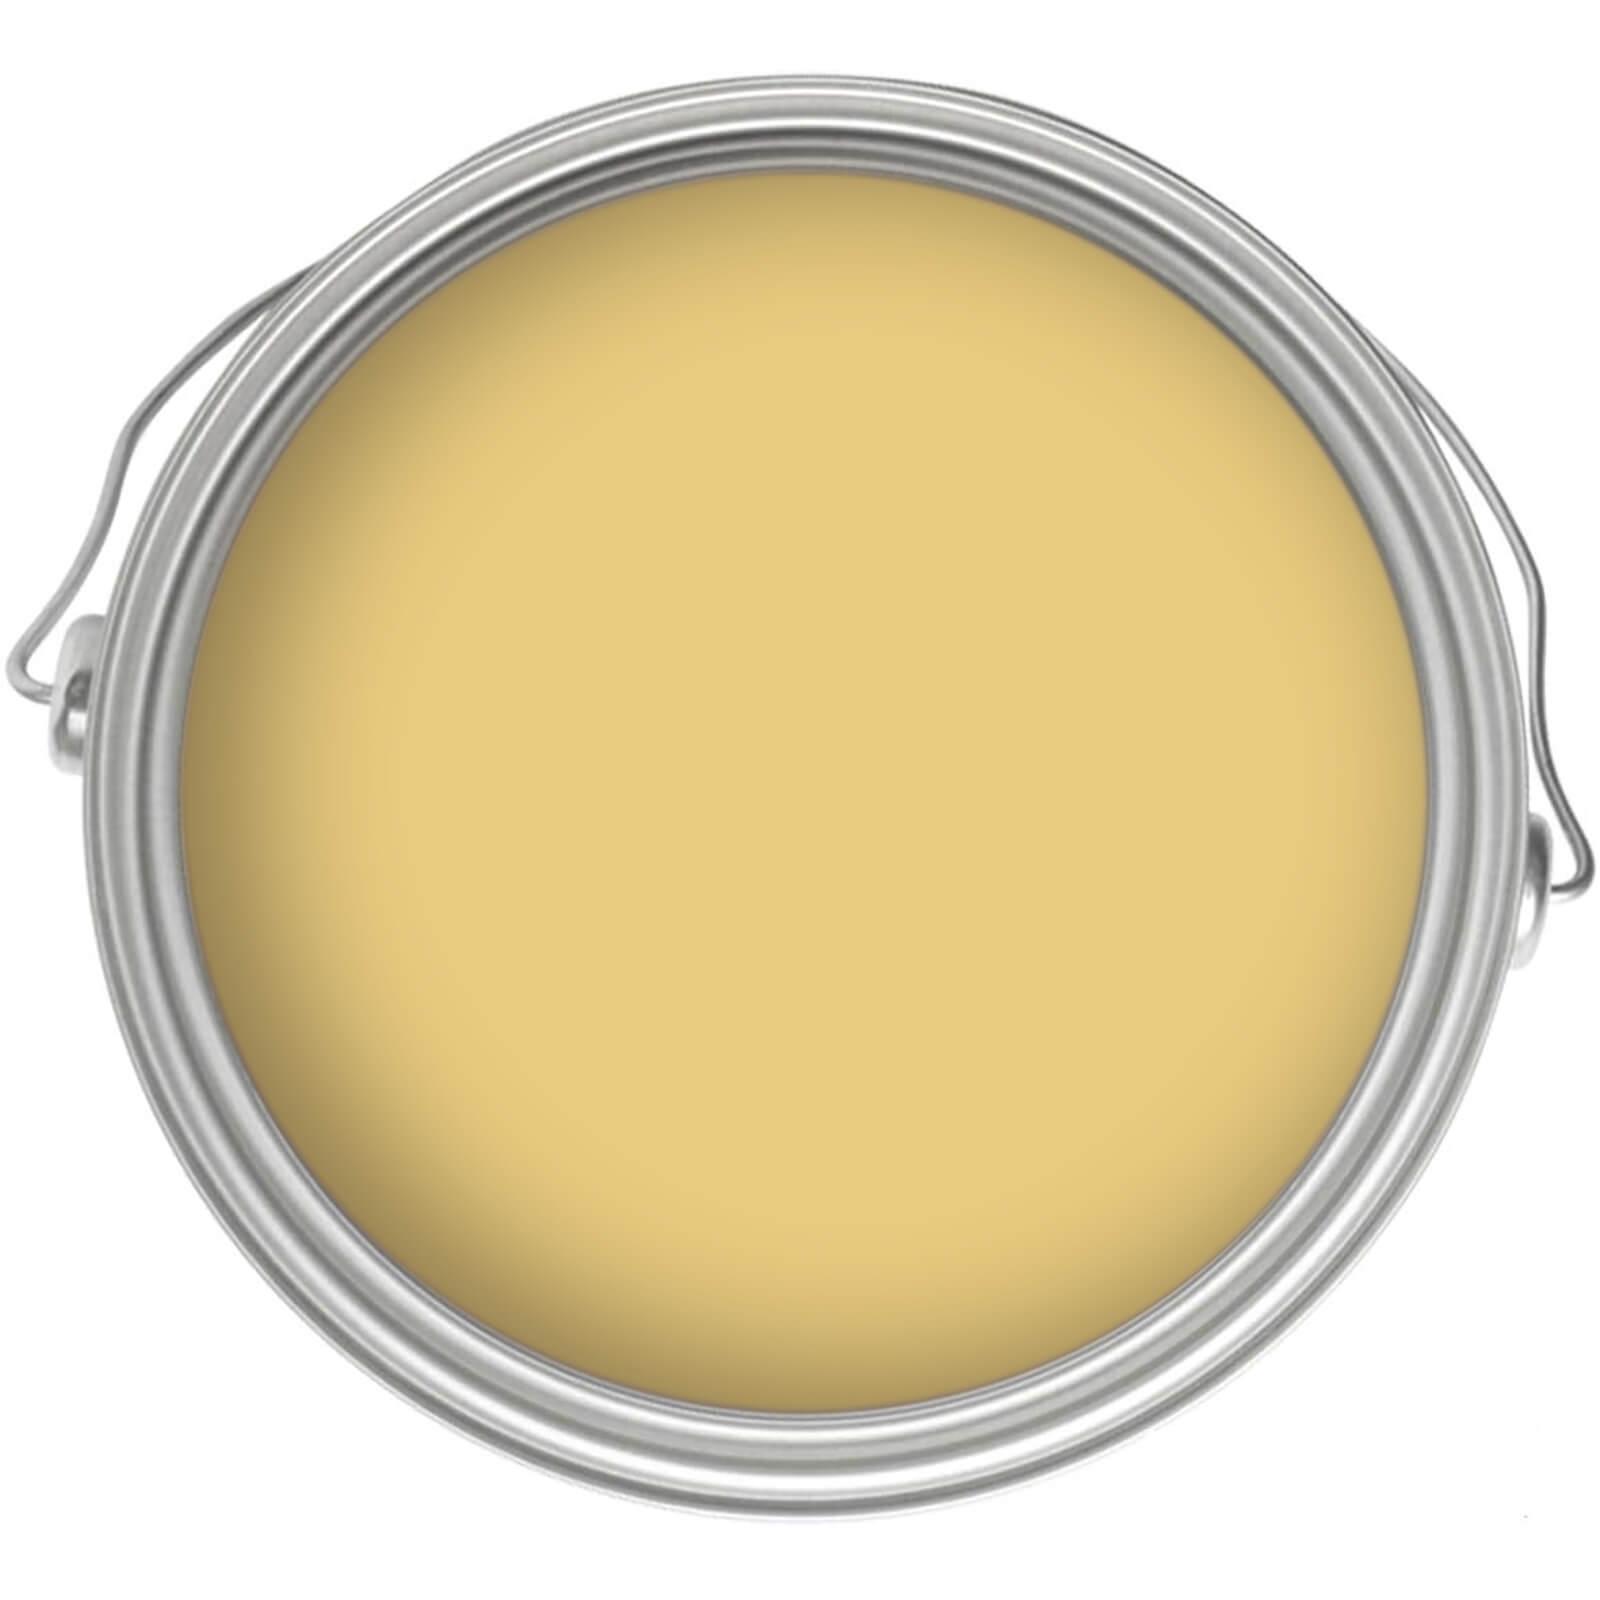 Craig & Rose 1829 Chalky Emulsion - Gloriana 5L